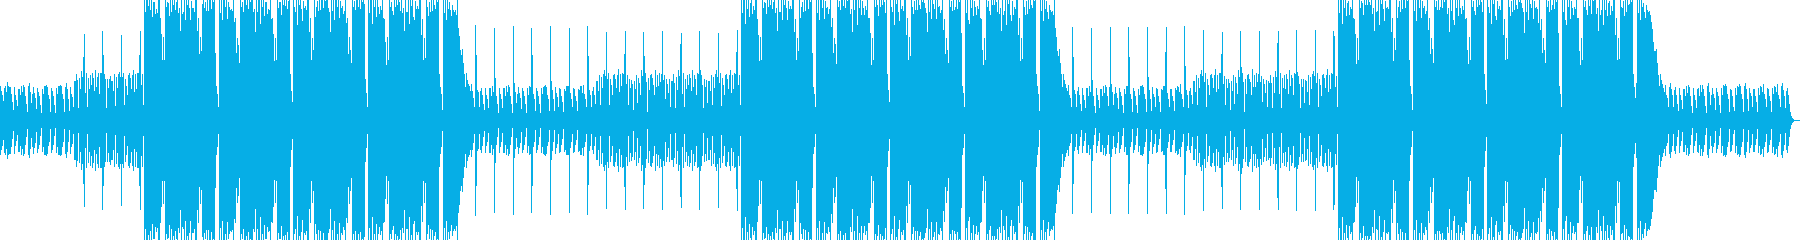 TikTok、ピアノハードトラップビートの再生済みの波形